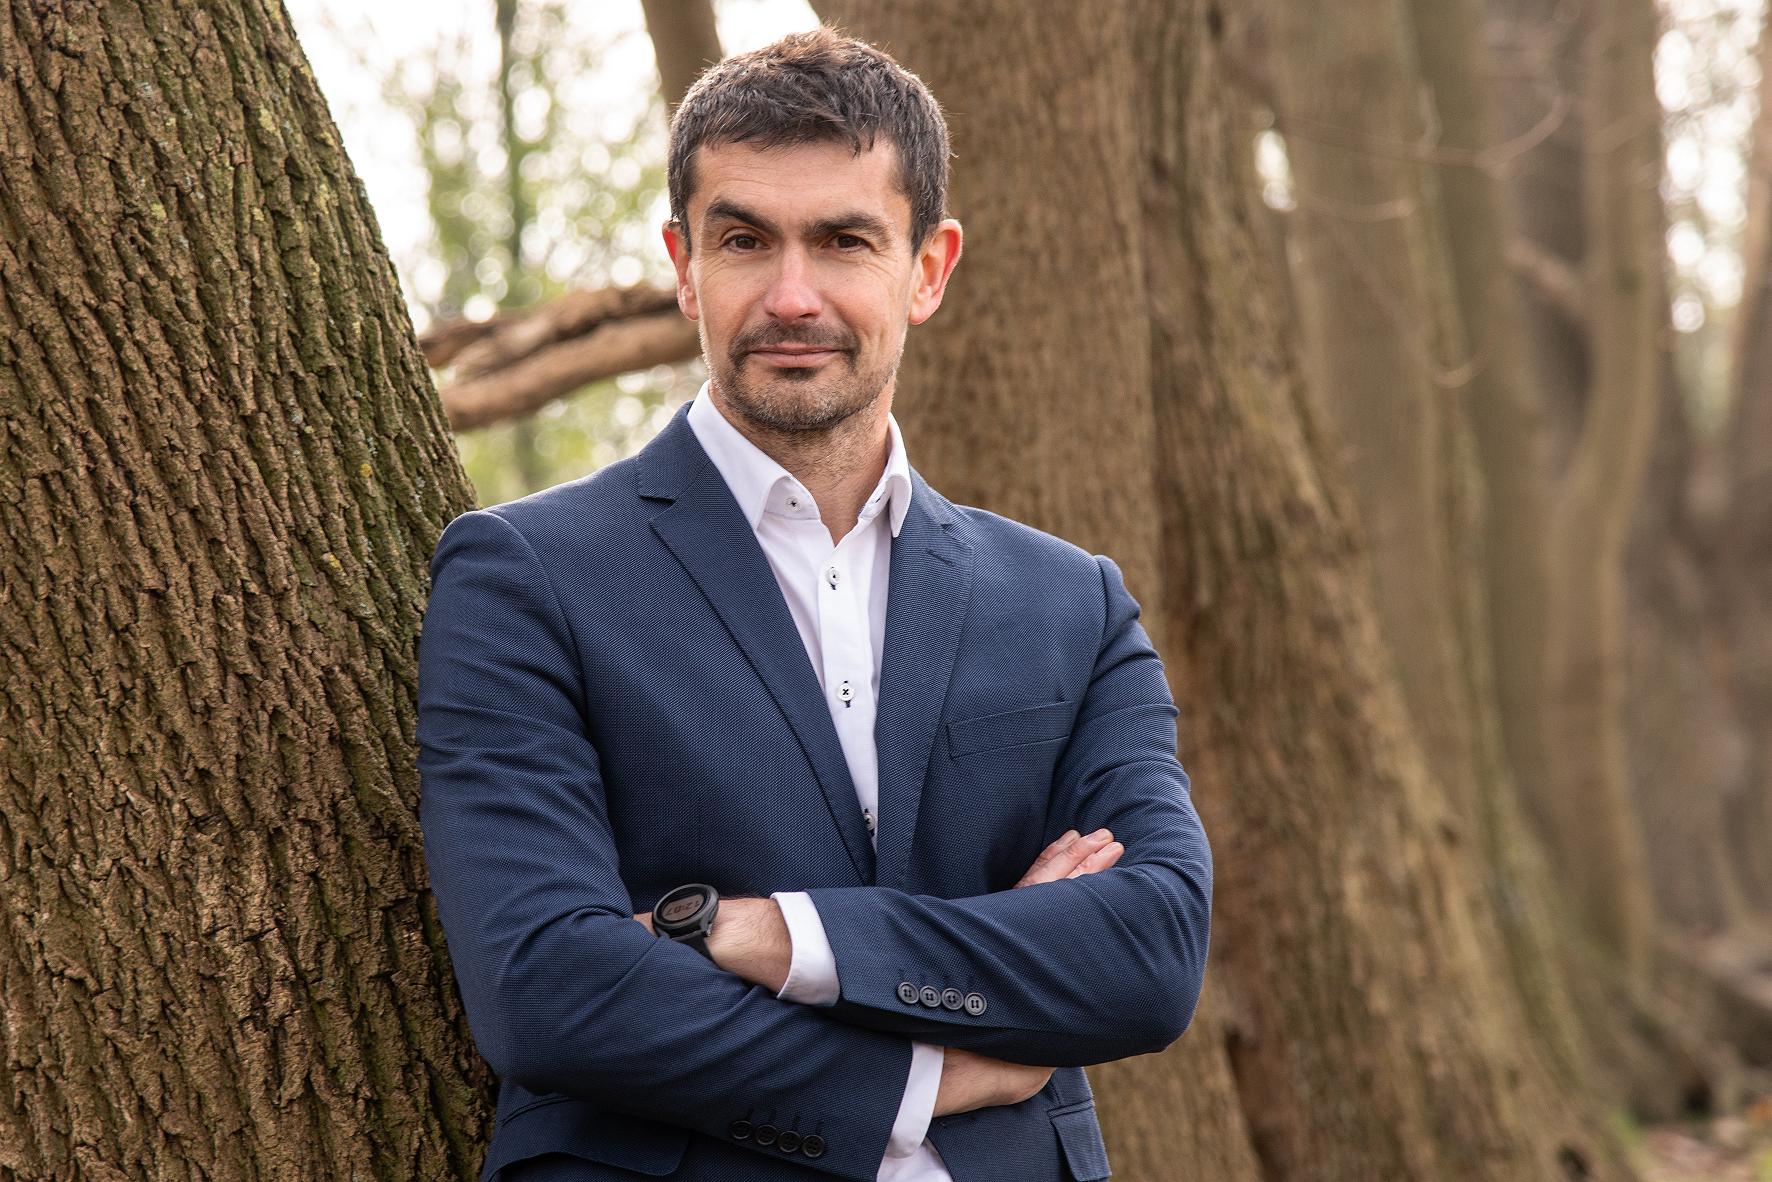 Dr. Jorge Guerra González - Mediation, Verfahrensbeistand, Umgangspflegschaft, Konflitkmanagement